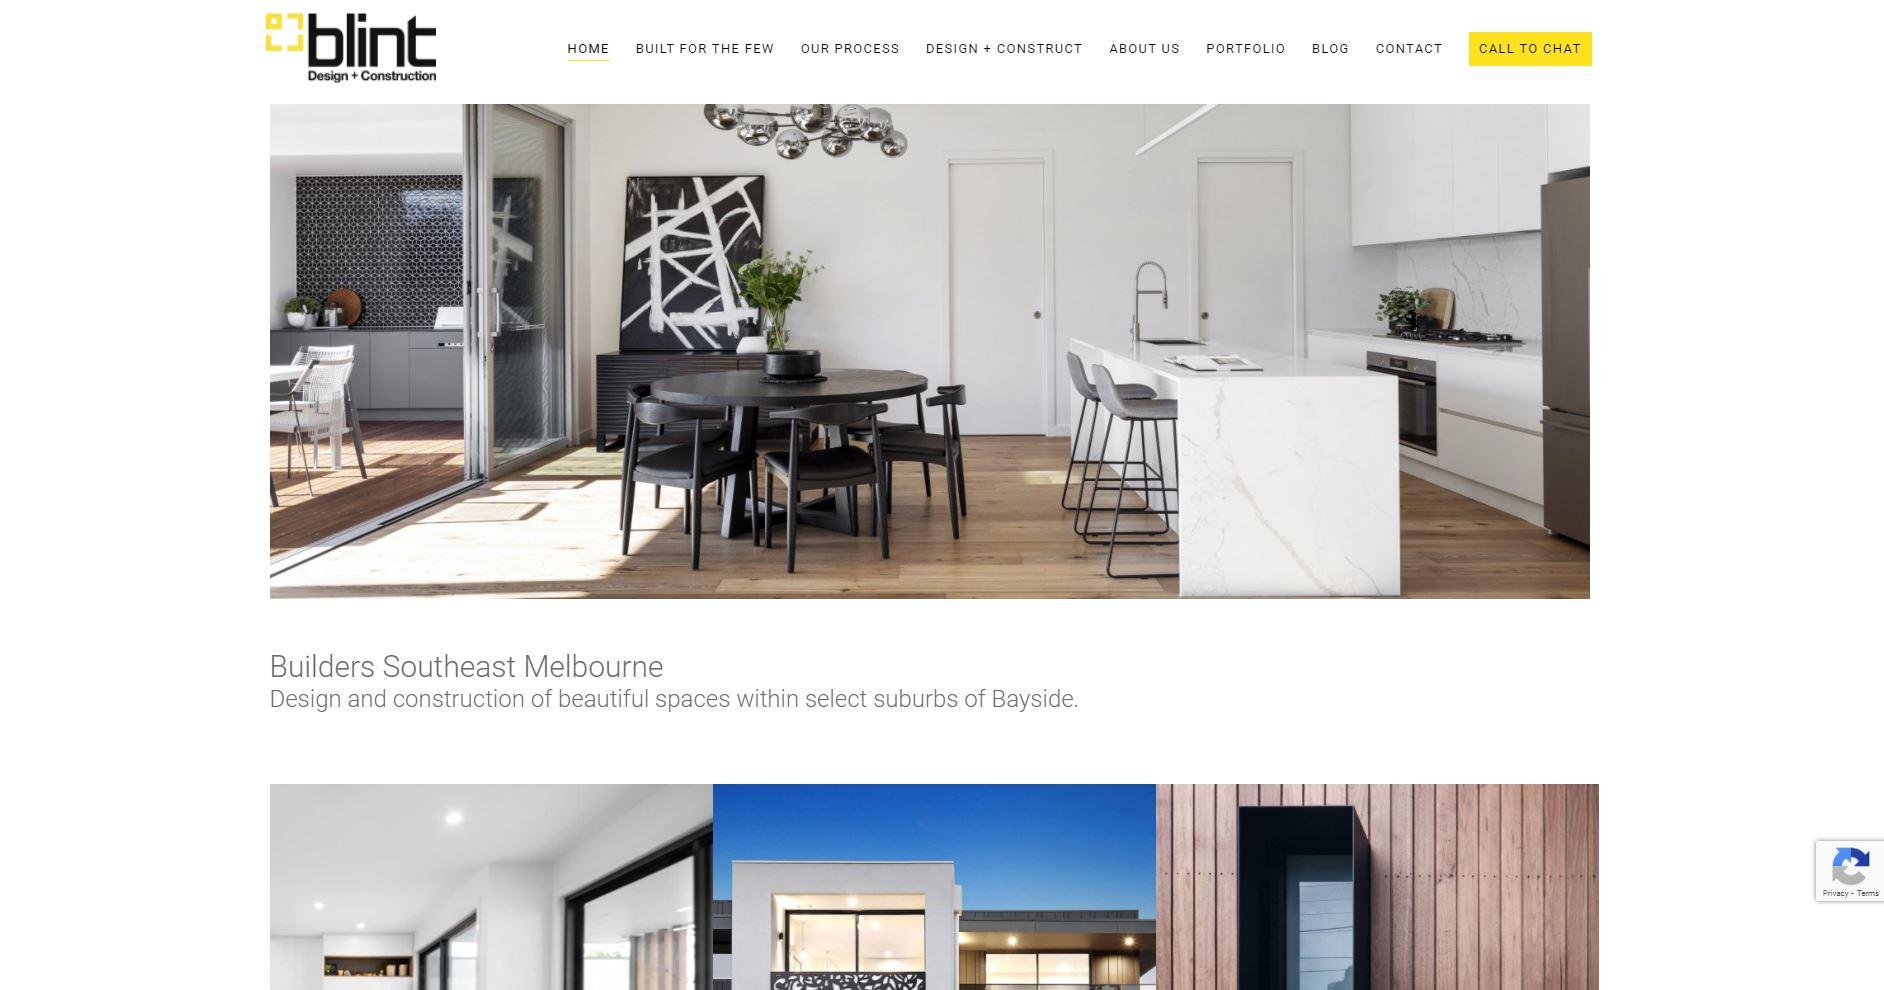 Blint Design + Construction